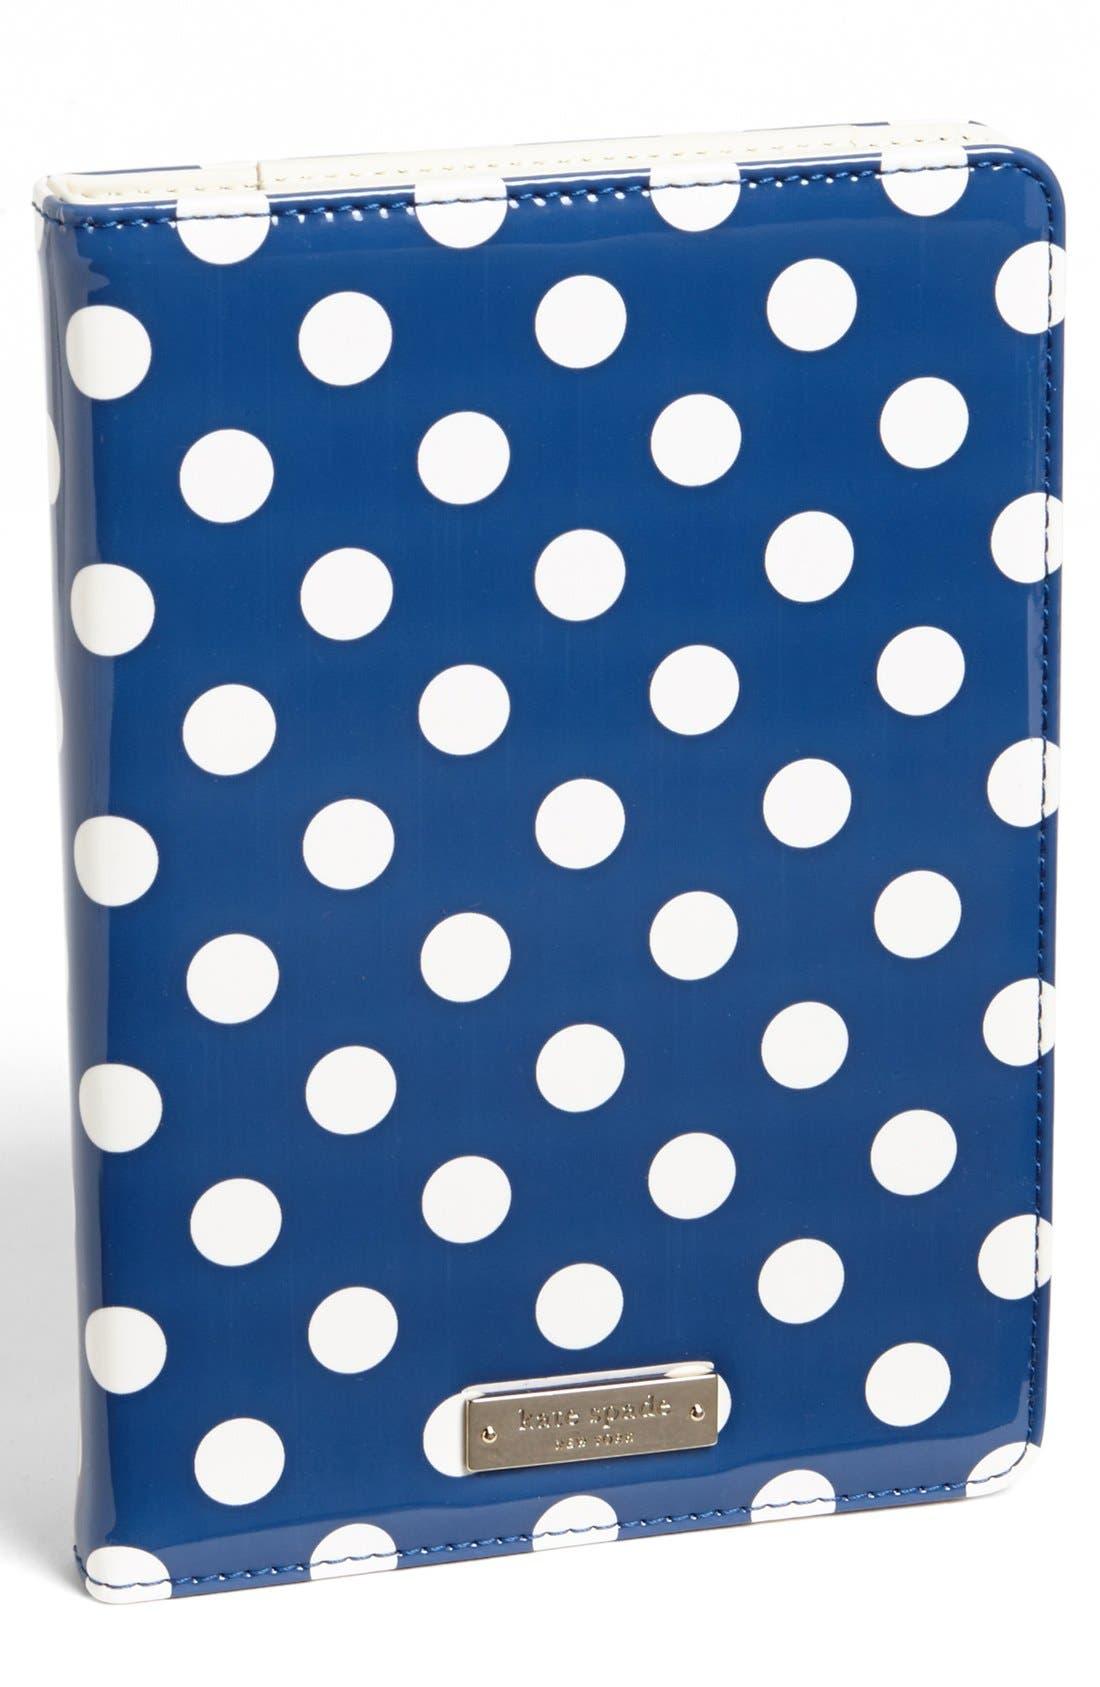 Alternate Image 1 Selected - kate spade new york 'carlisle' iPad mini folio